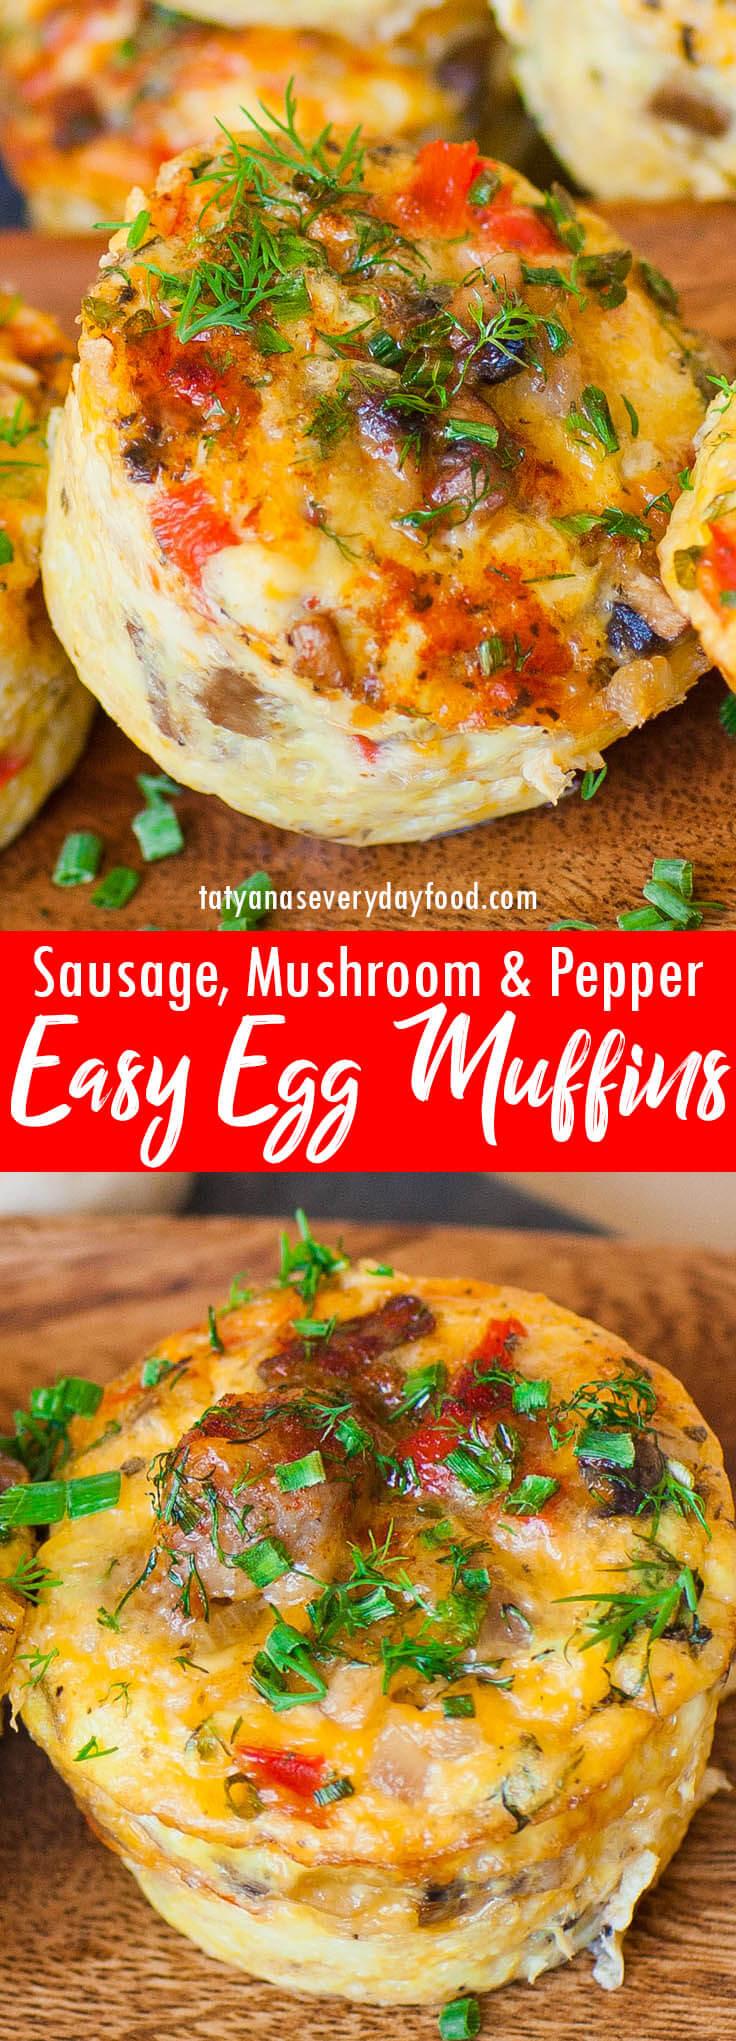 Easy Egg Muffins video recipe